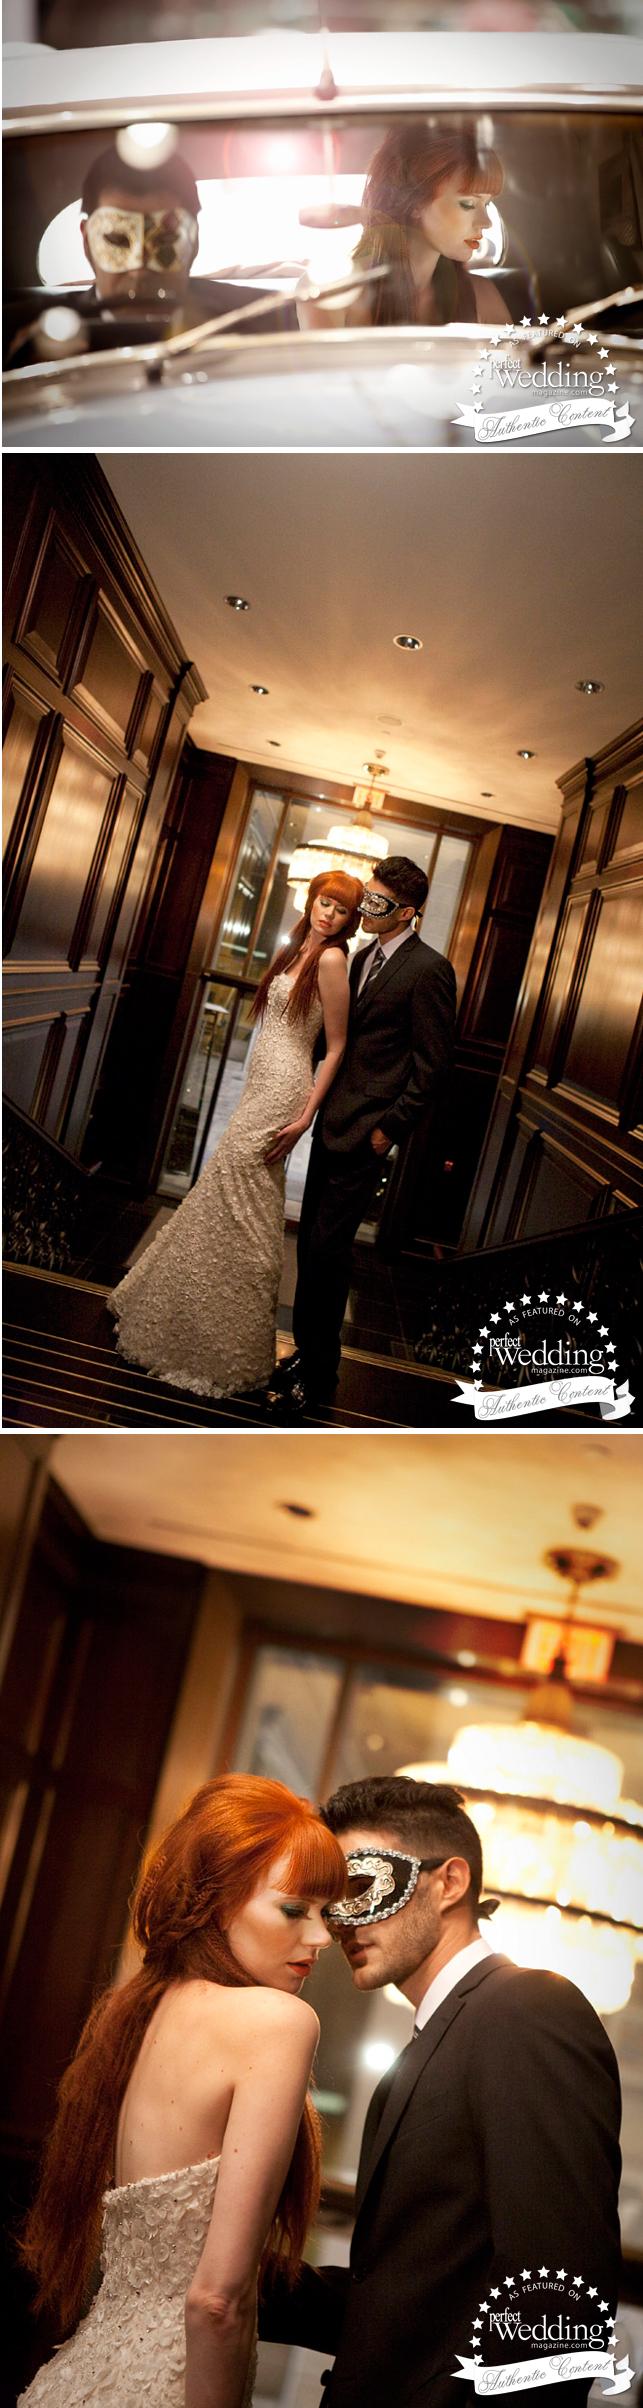 Halloween Wedding, Wedding Inspiration, Bridal Trends, Halloween Bridal Theme, Rosewood Hotel Georgia, Perfect Wedding Magazine, Perfect Wedding Magazine Blog, Vera Wang Bridal, Halloween Bridal Makeup, Romona Keveza